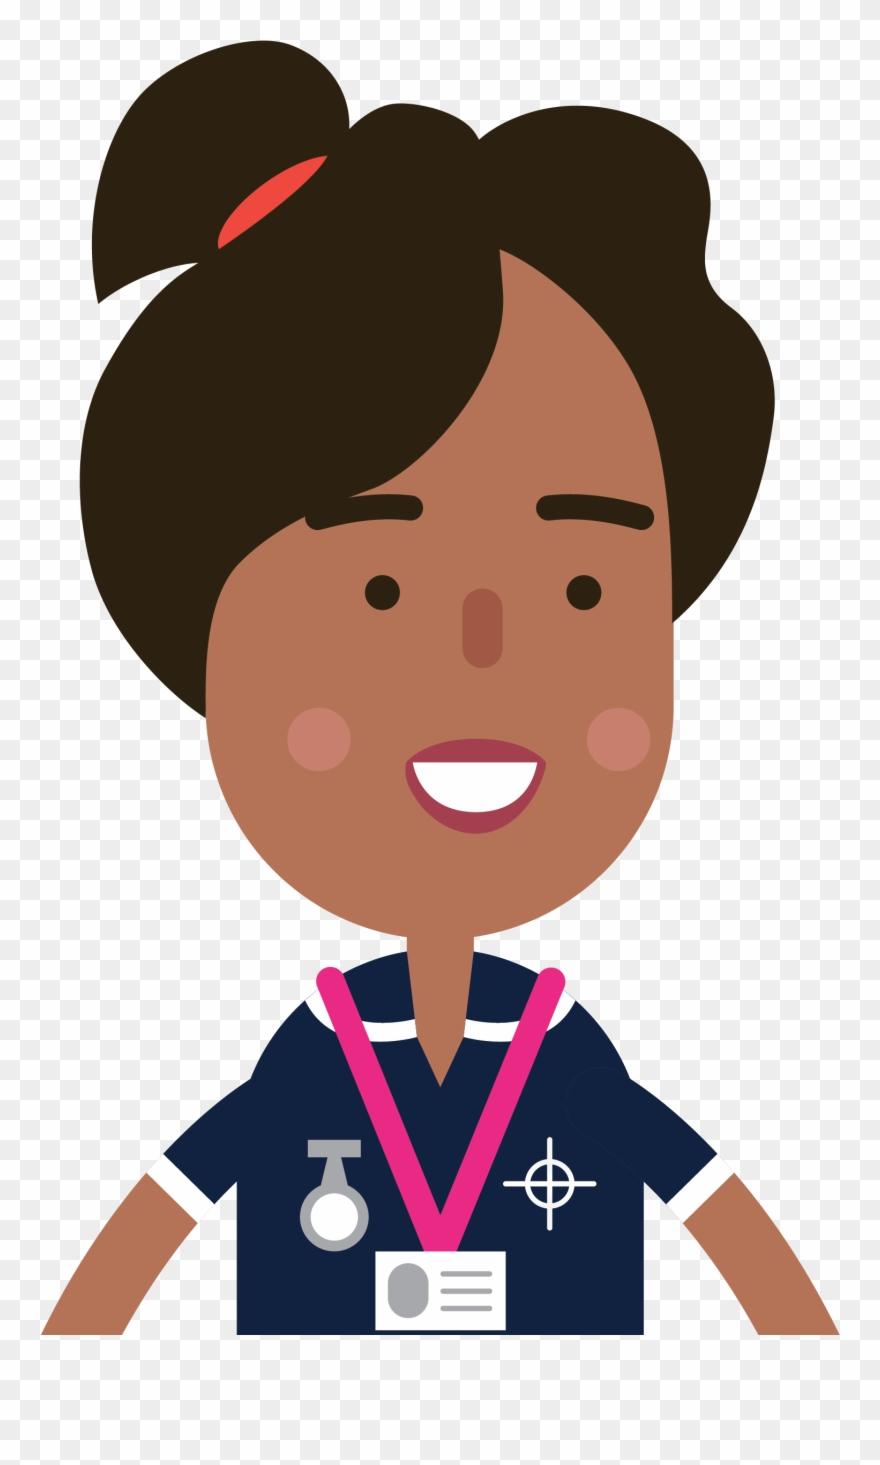 Midwife clipart free Headshot Nurse B - Cartoon Midwife Clipart (#259161 ... free